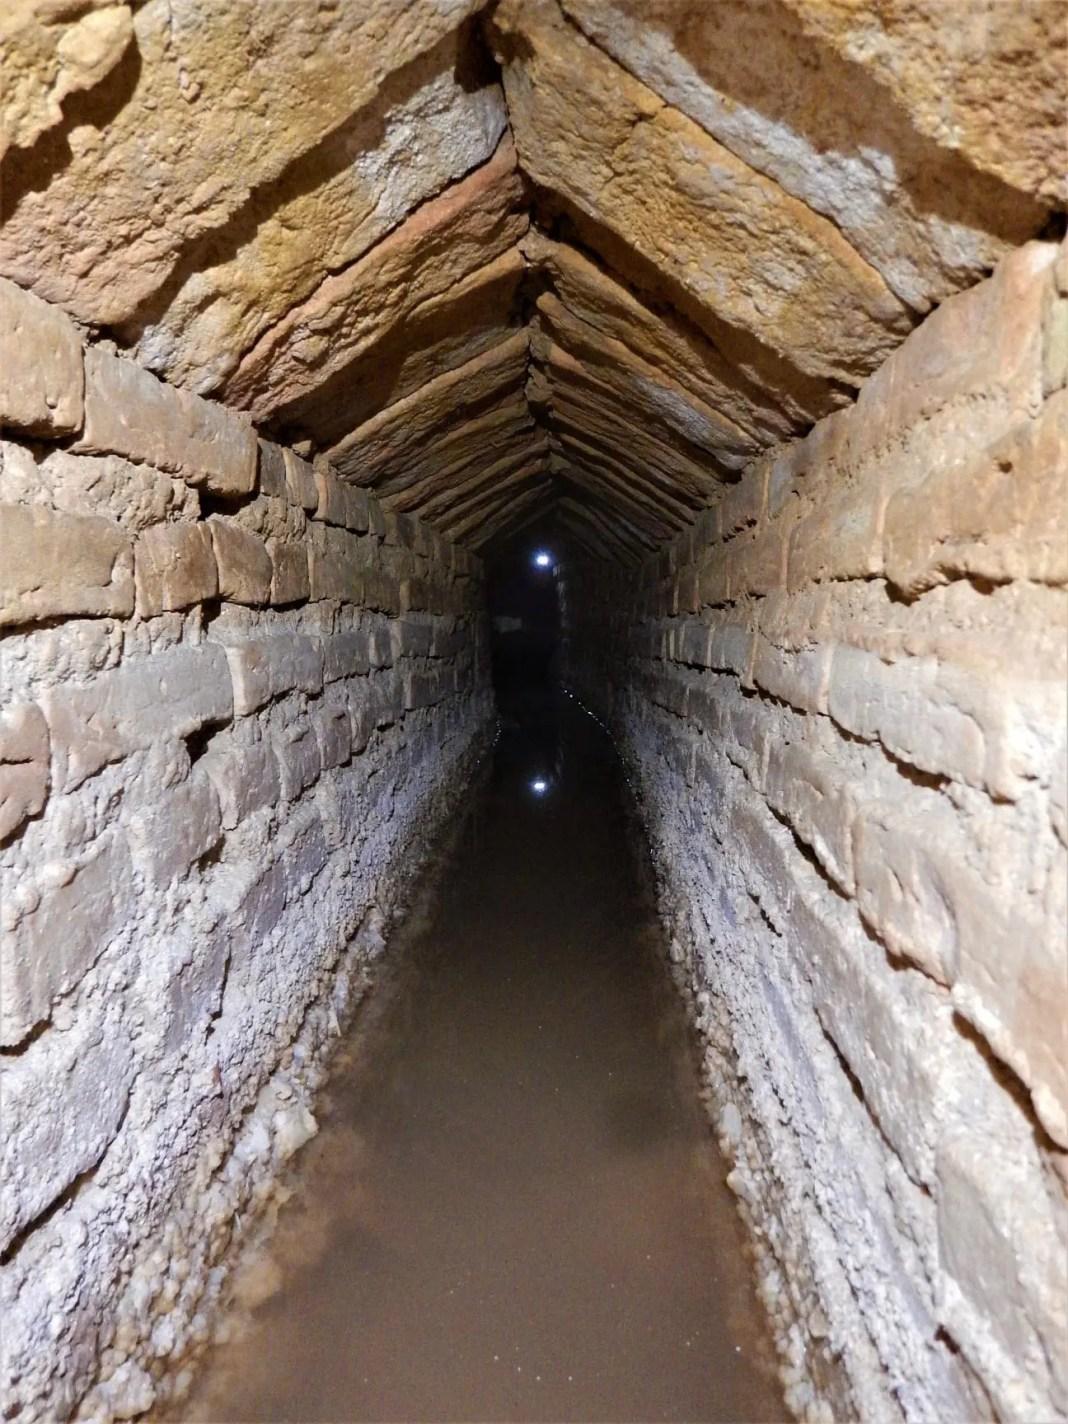 Localizan en Carmona una nueva mina de agua de origen romano 7